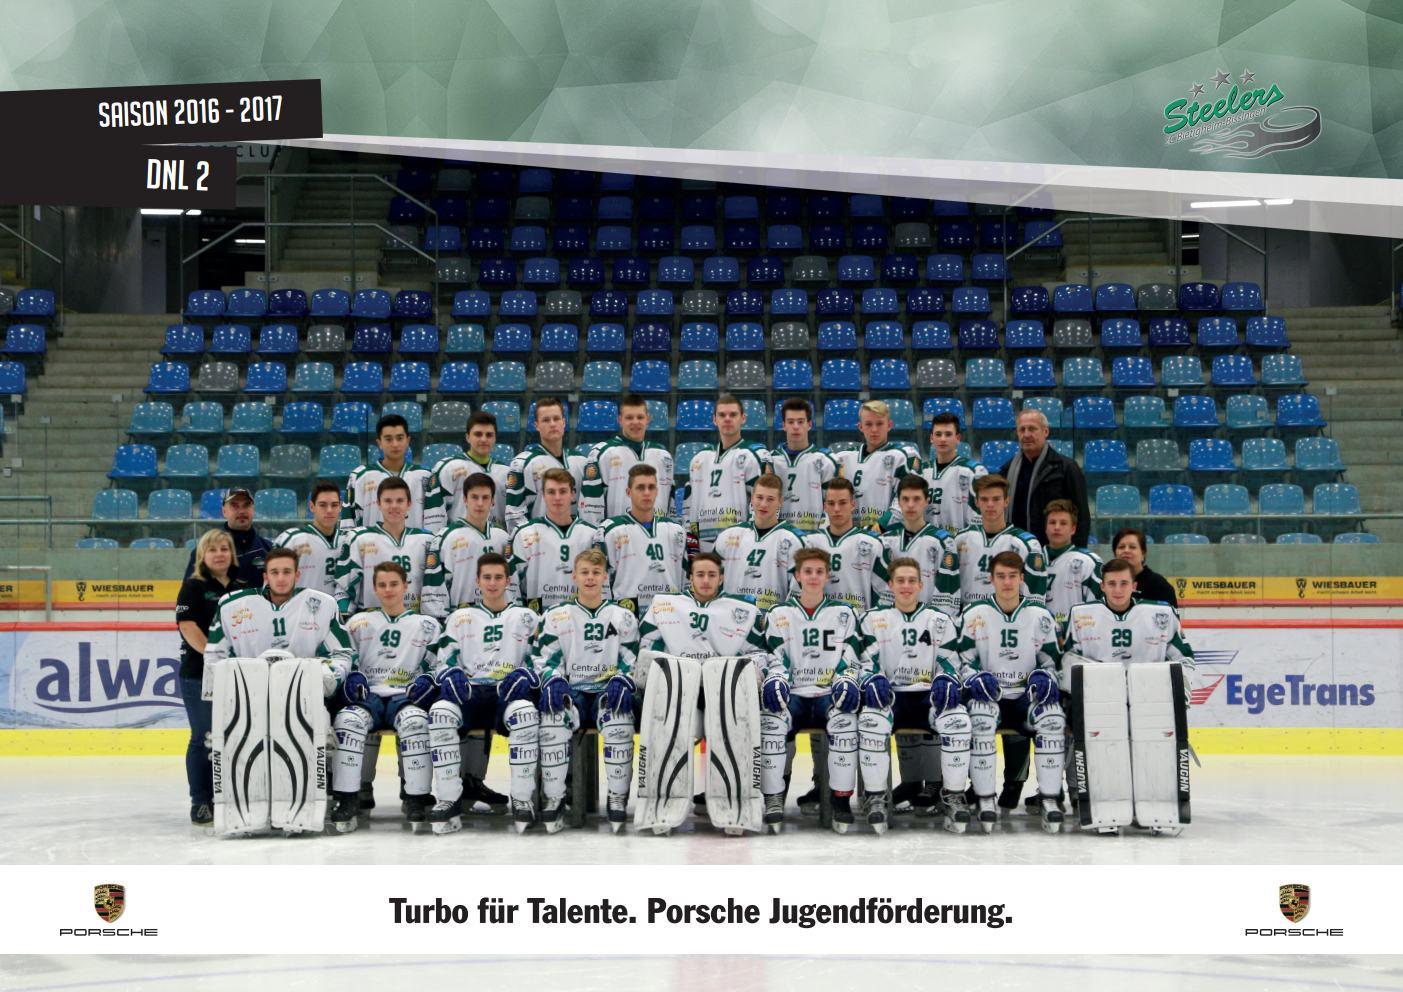 eishockey steelers